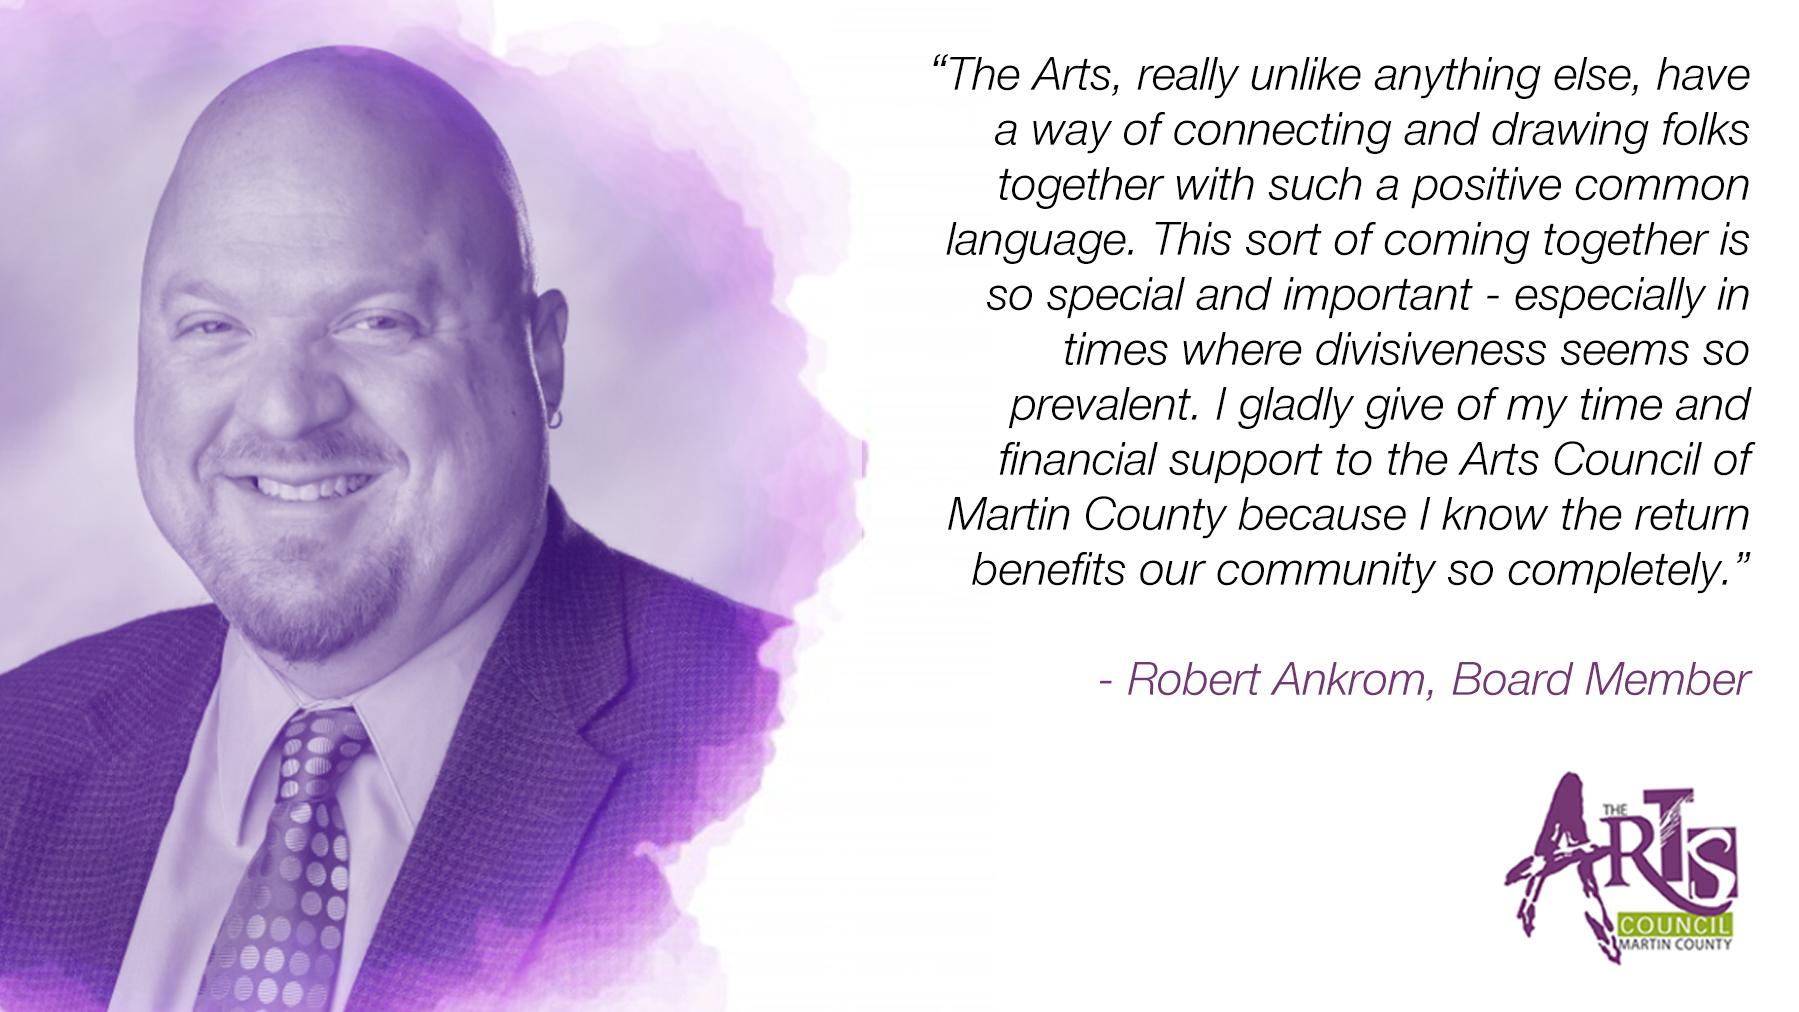 Robert Ankrom